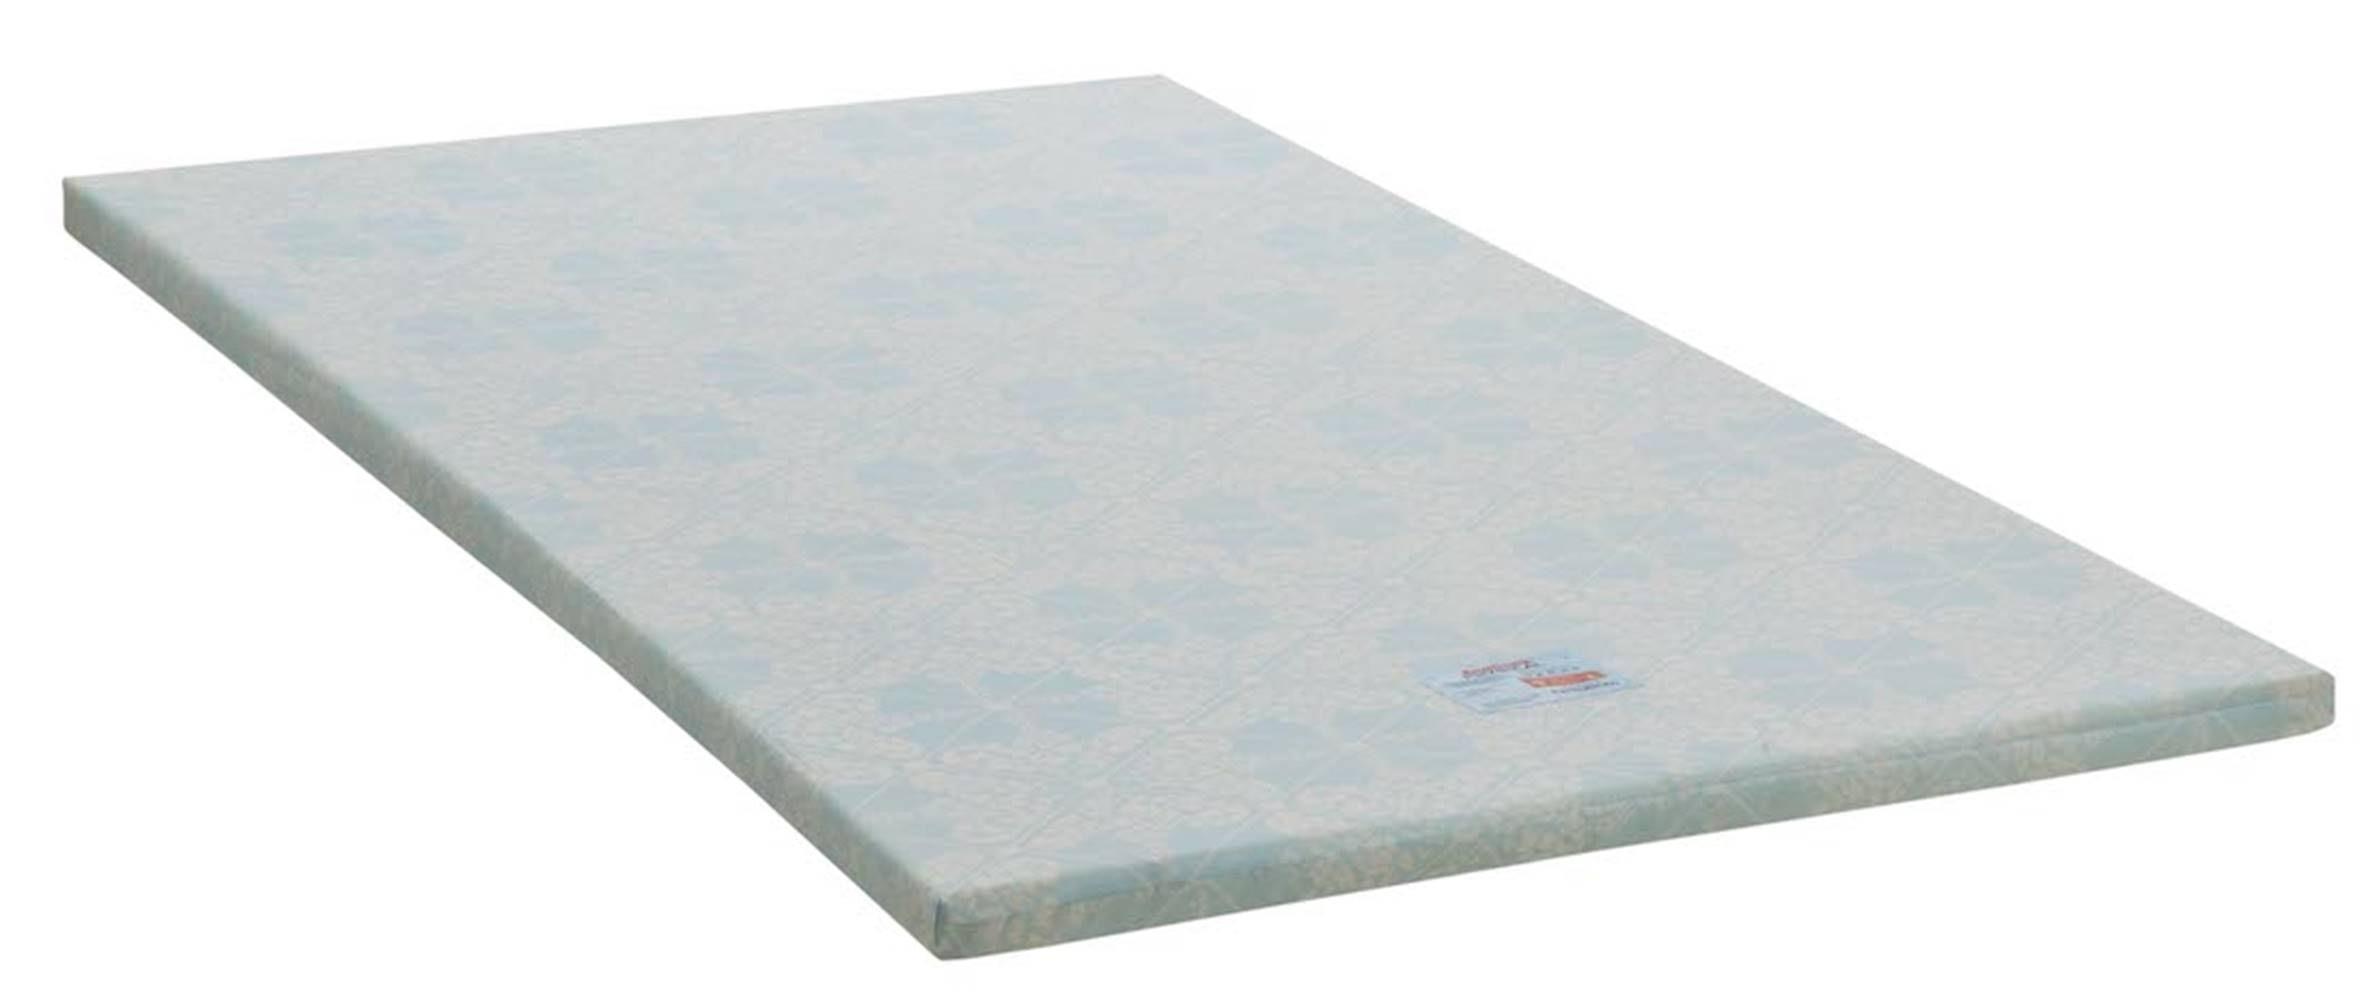 Colchonete Physical Baixo Solteiro 88 cm (LARG) Branco e Azul - 42948